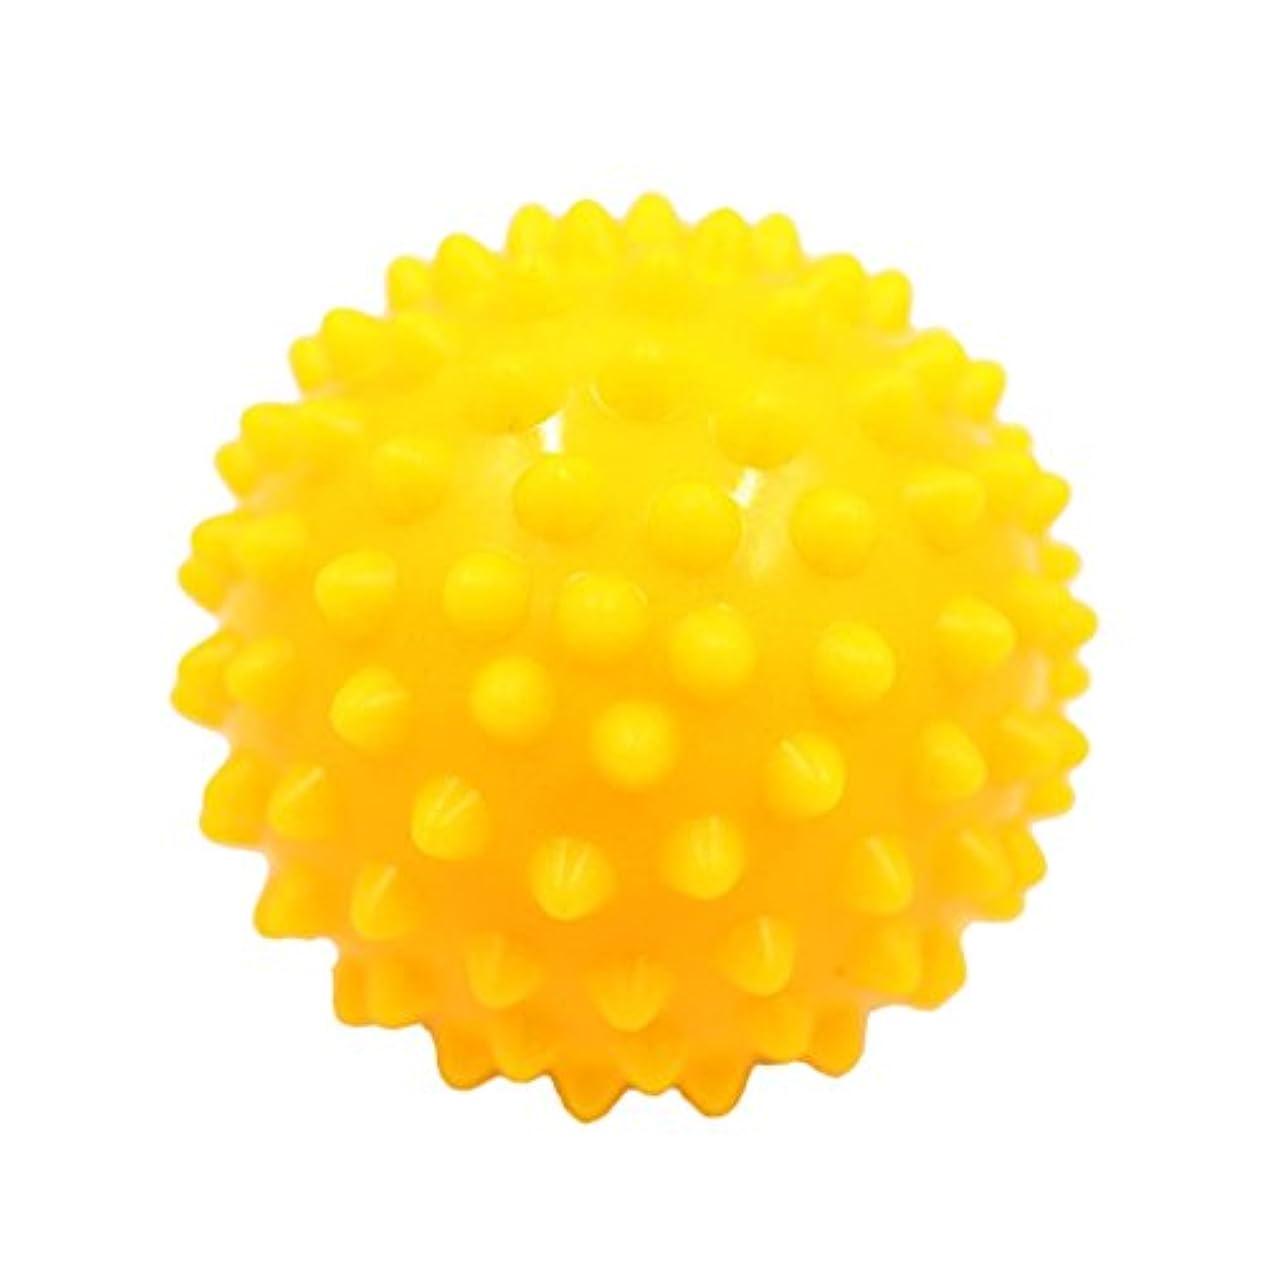 Baosity マッサージボール マッサージ器 ボディ  スパイク マッサージ 刺激ボール 3色選べ - 黄